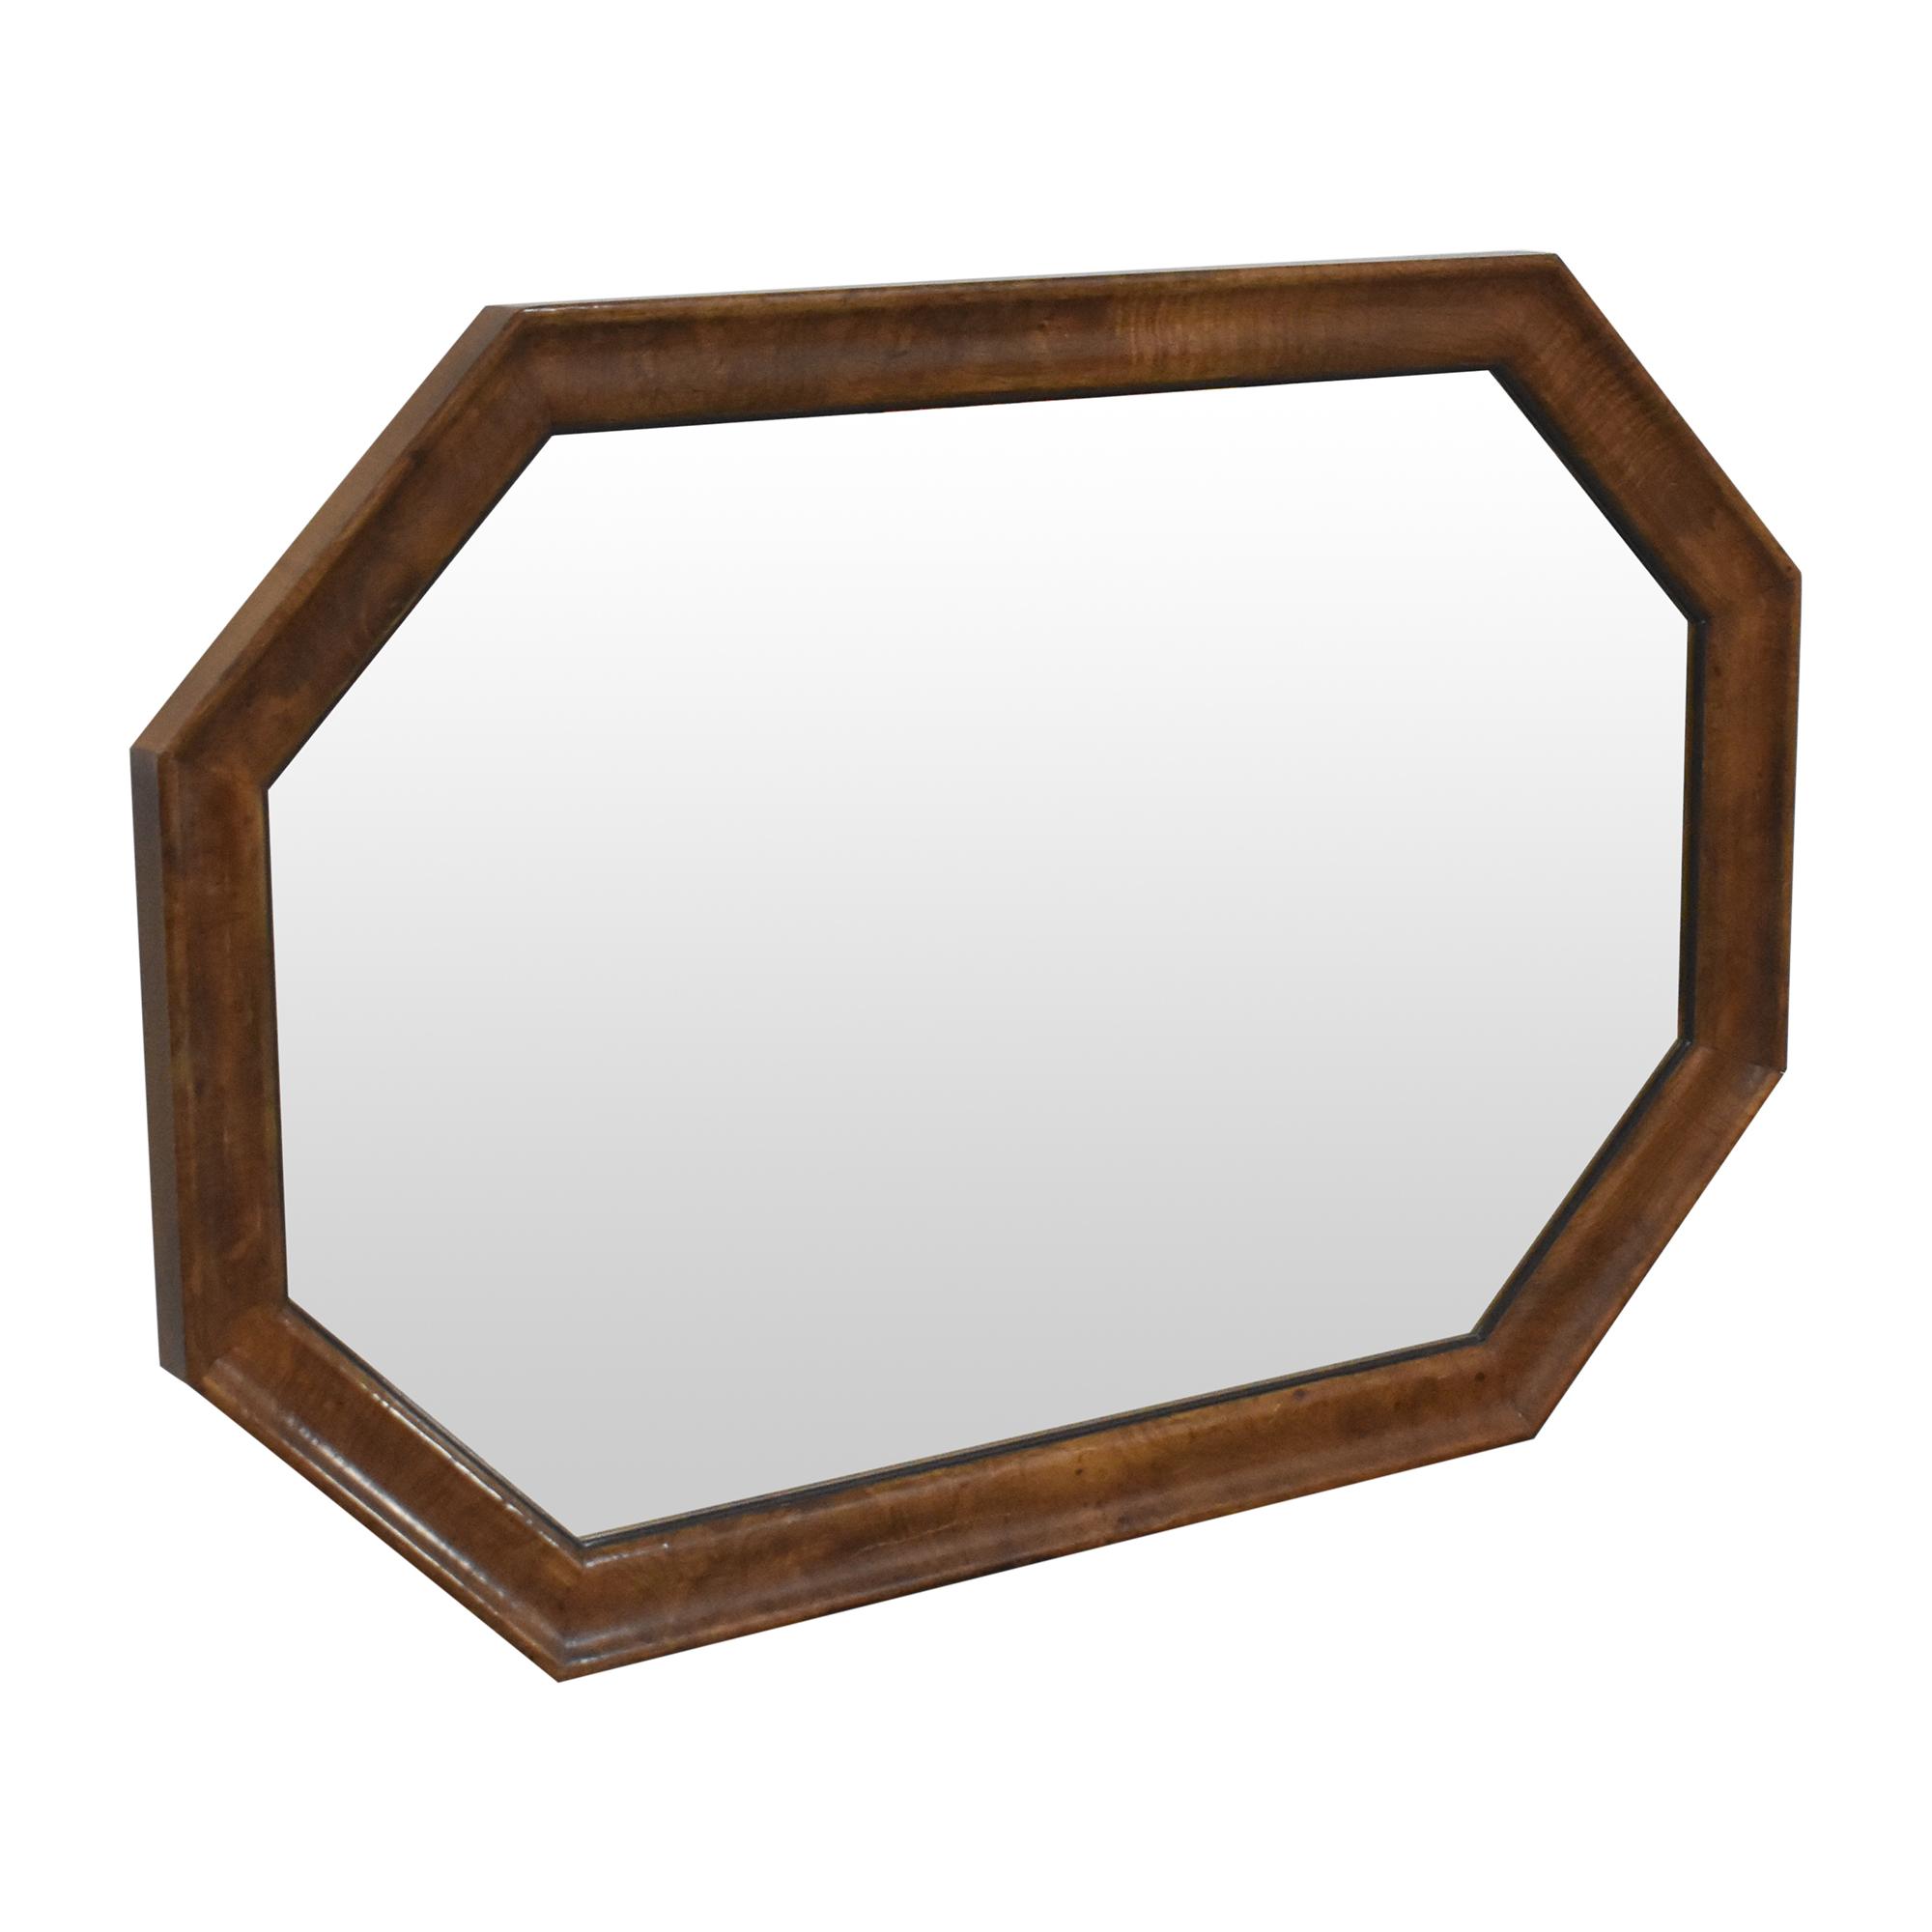 buy Henredon Framed Wall Mirror Henredon Furniture